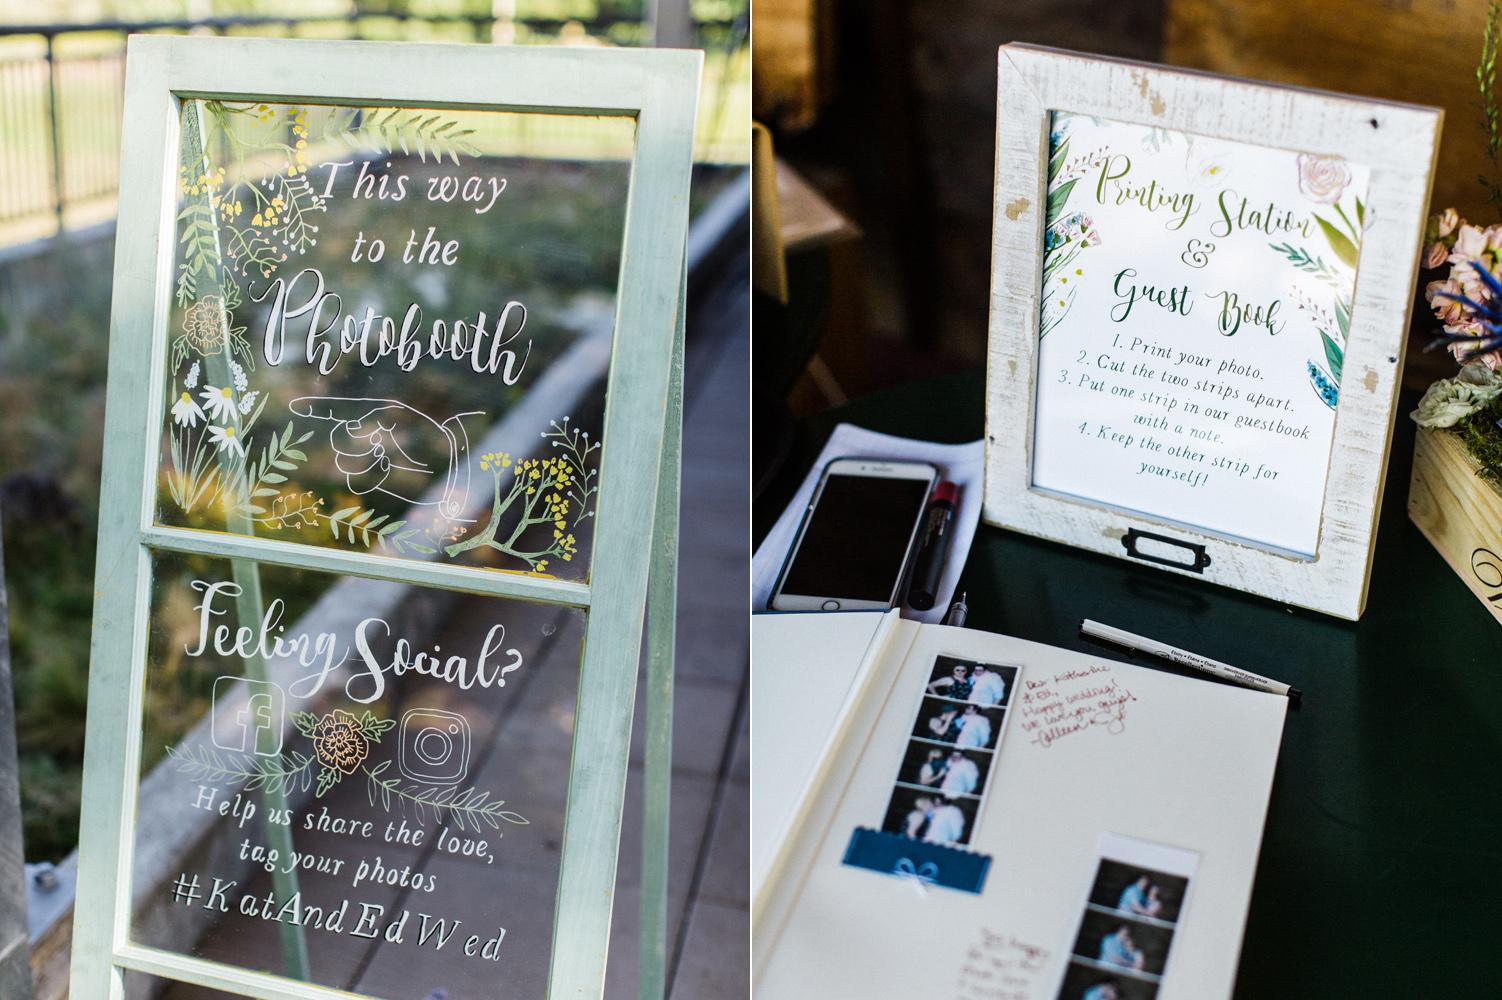 university of washington center for urban horticulture wedding details.jpg